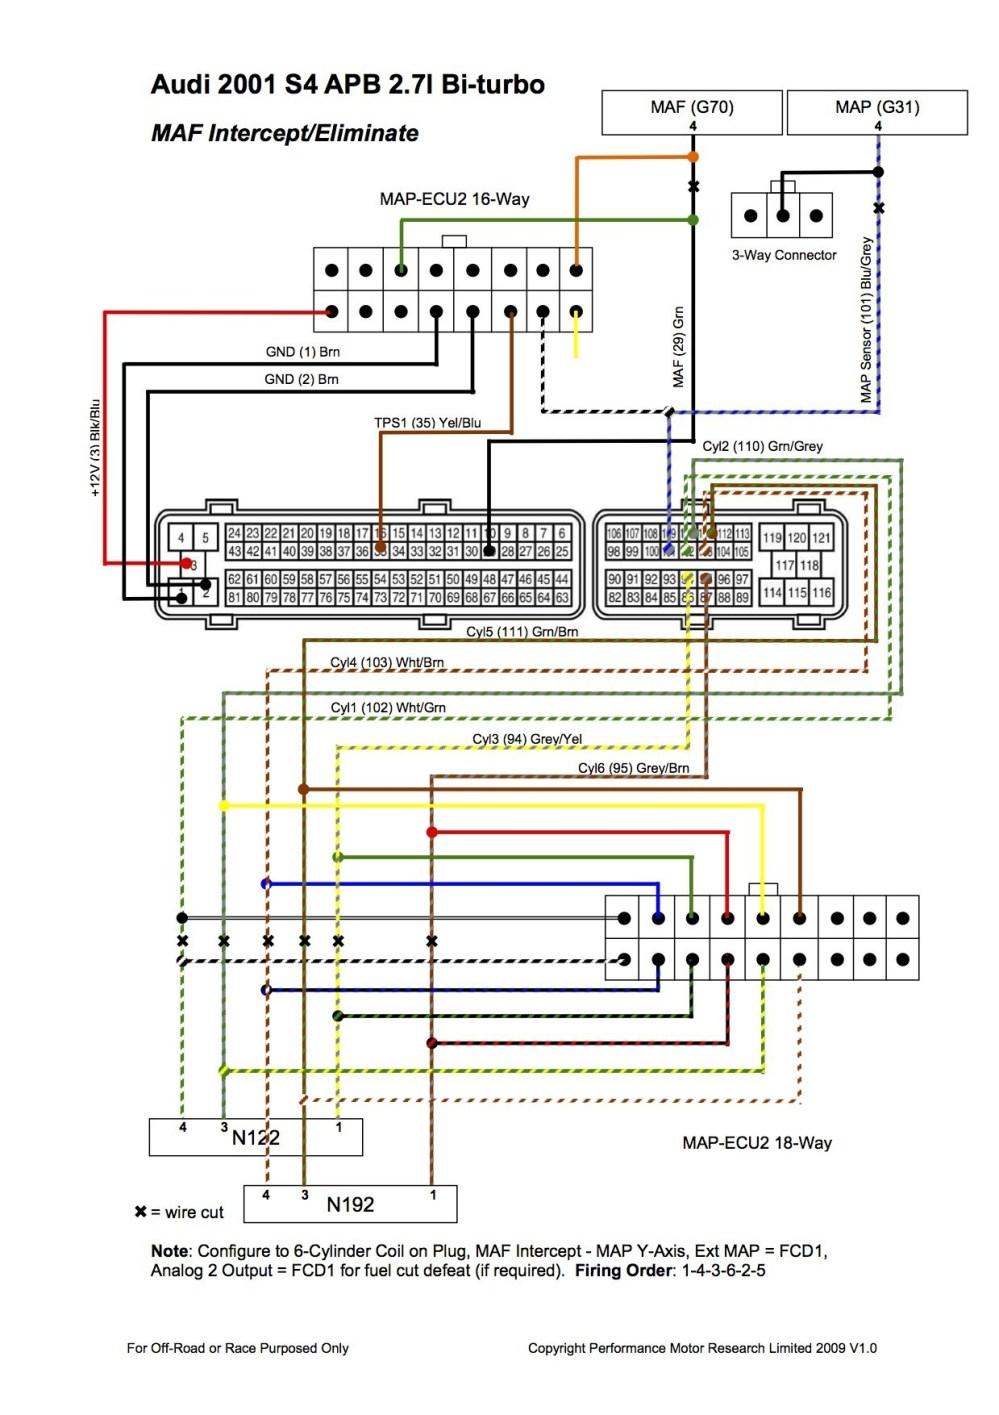 medium resolution of 2007 dodge nitro 37 serpentine belt diagram schematic diagram2007 dodge grand caravan wiring diagrams best wiring